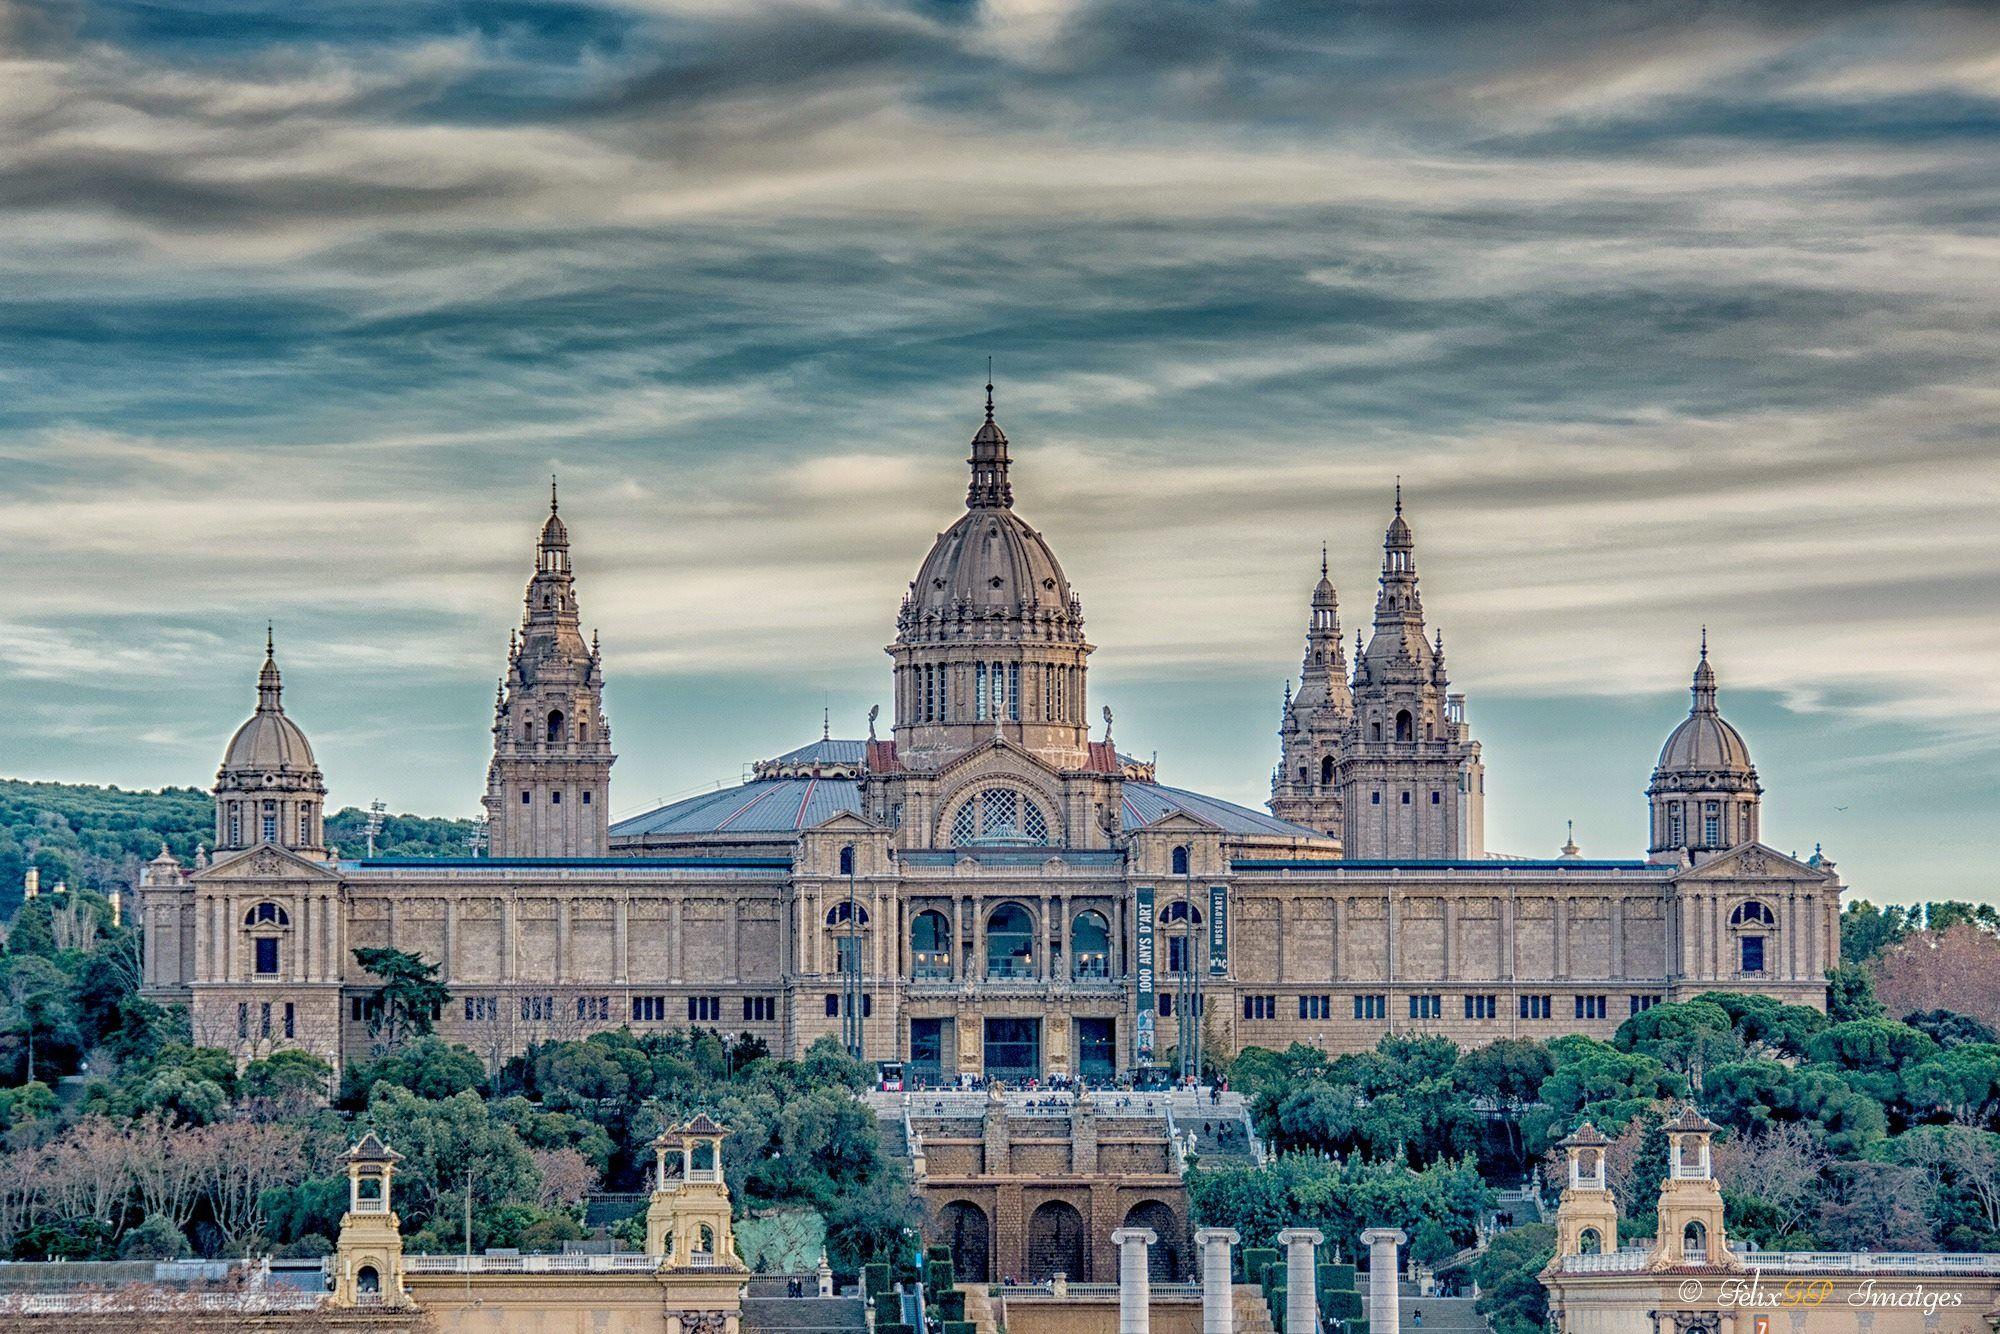 Mnac museu nacional dart de catalunya en montjuic